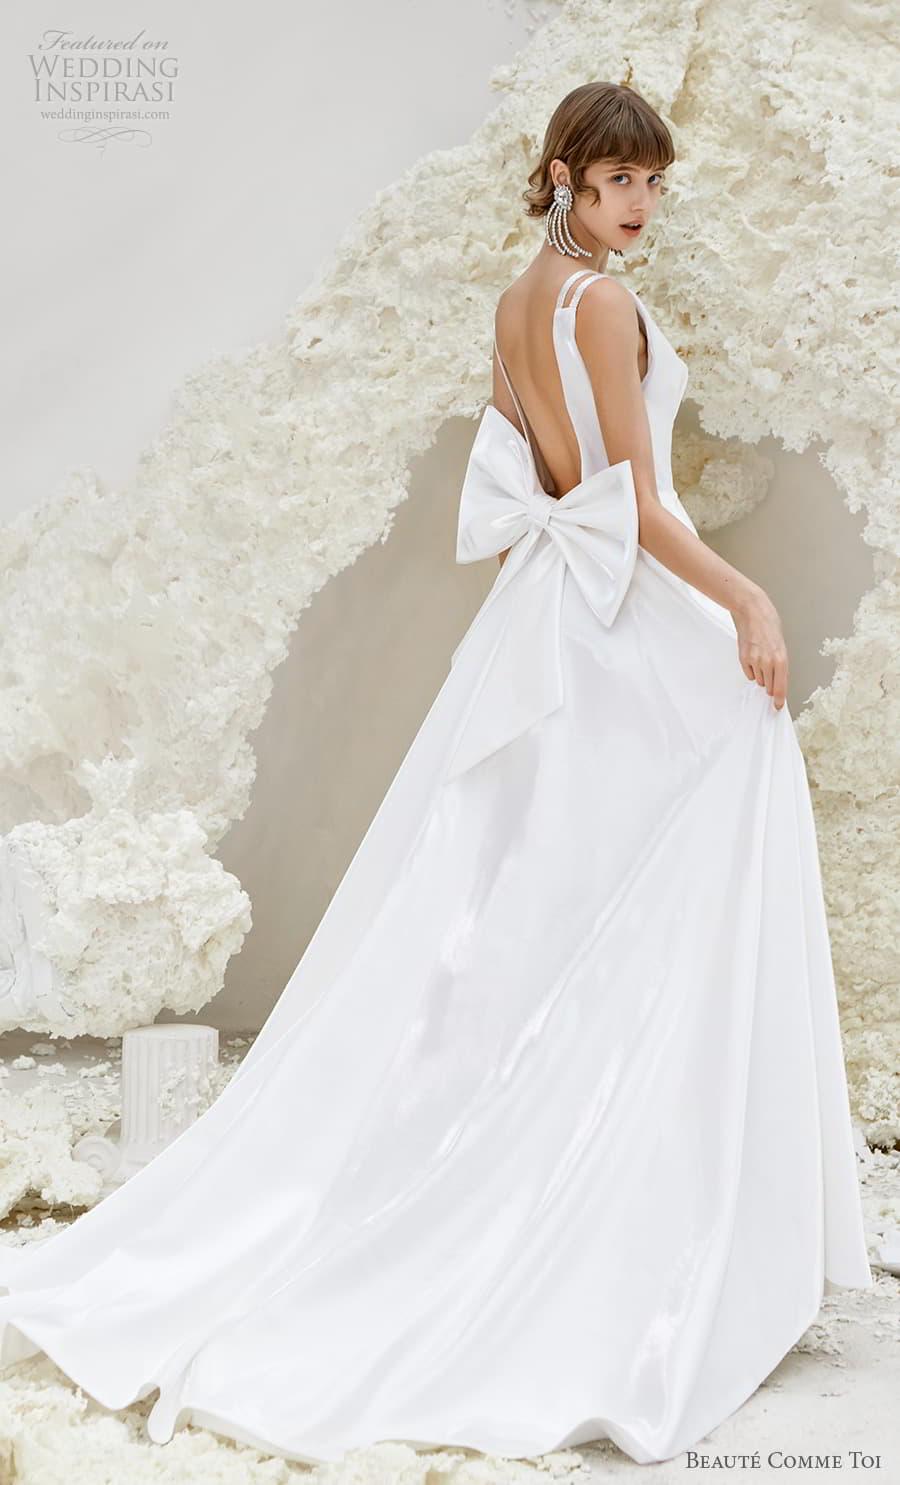 beaute comme toi spring 2022 bridal double strap deep v neckline simple minimalist modern chic a line wedding dress low ribbon back chapel train (phyllis) bv